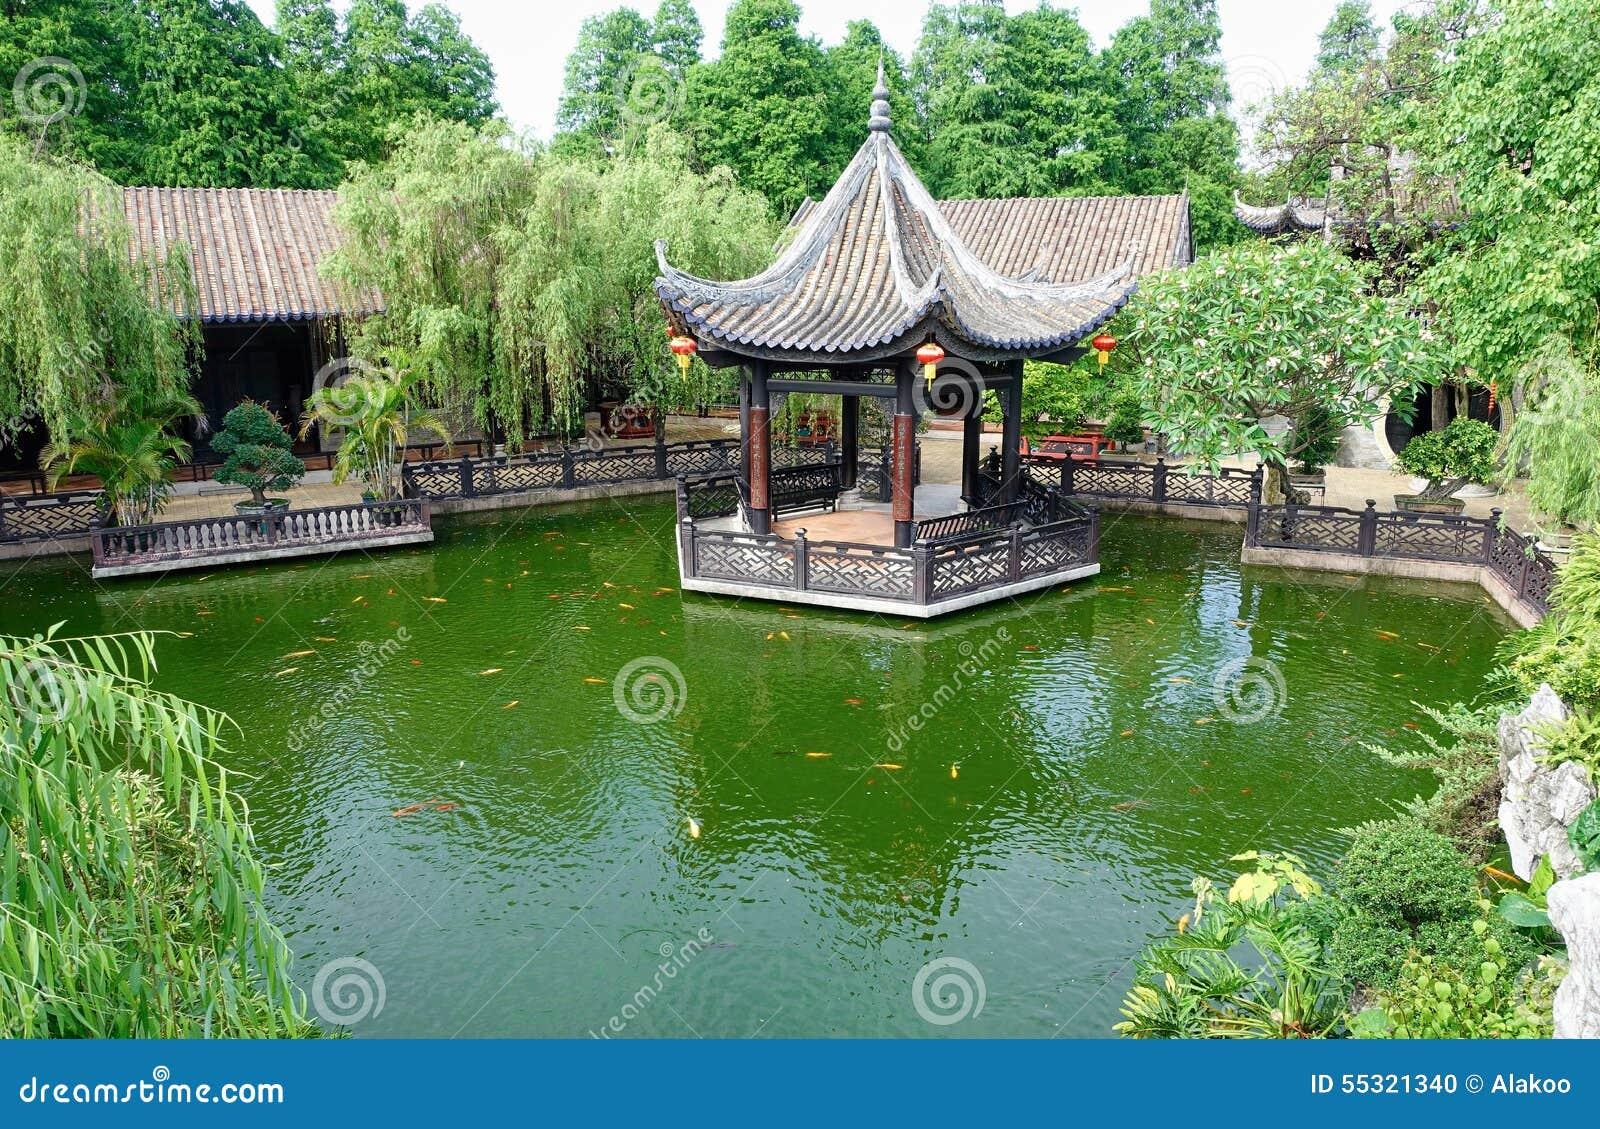 Landscaping gazebo chinese garden stock photo image of for Asian pond design